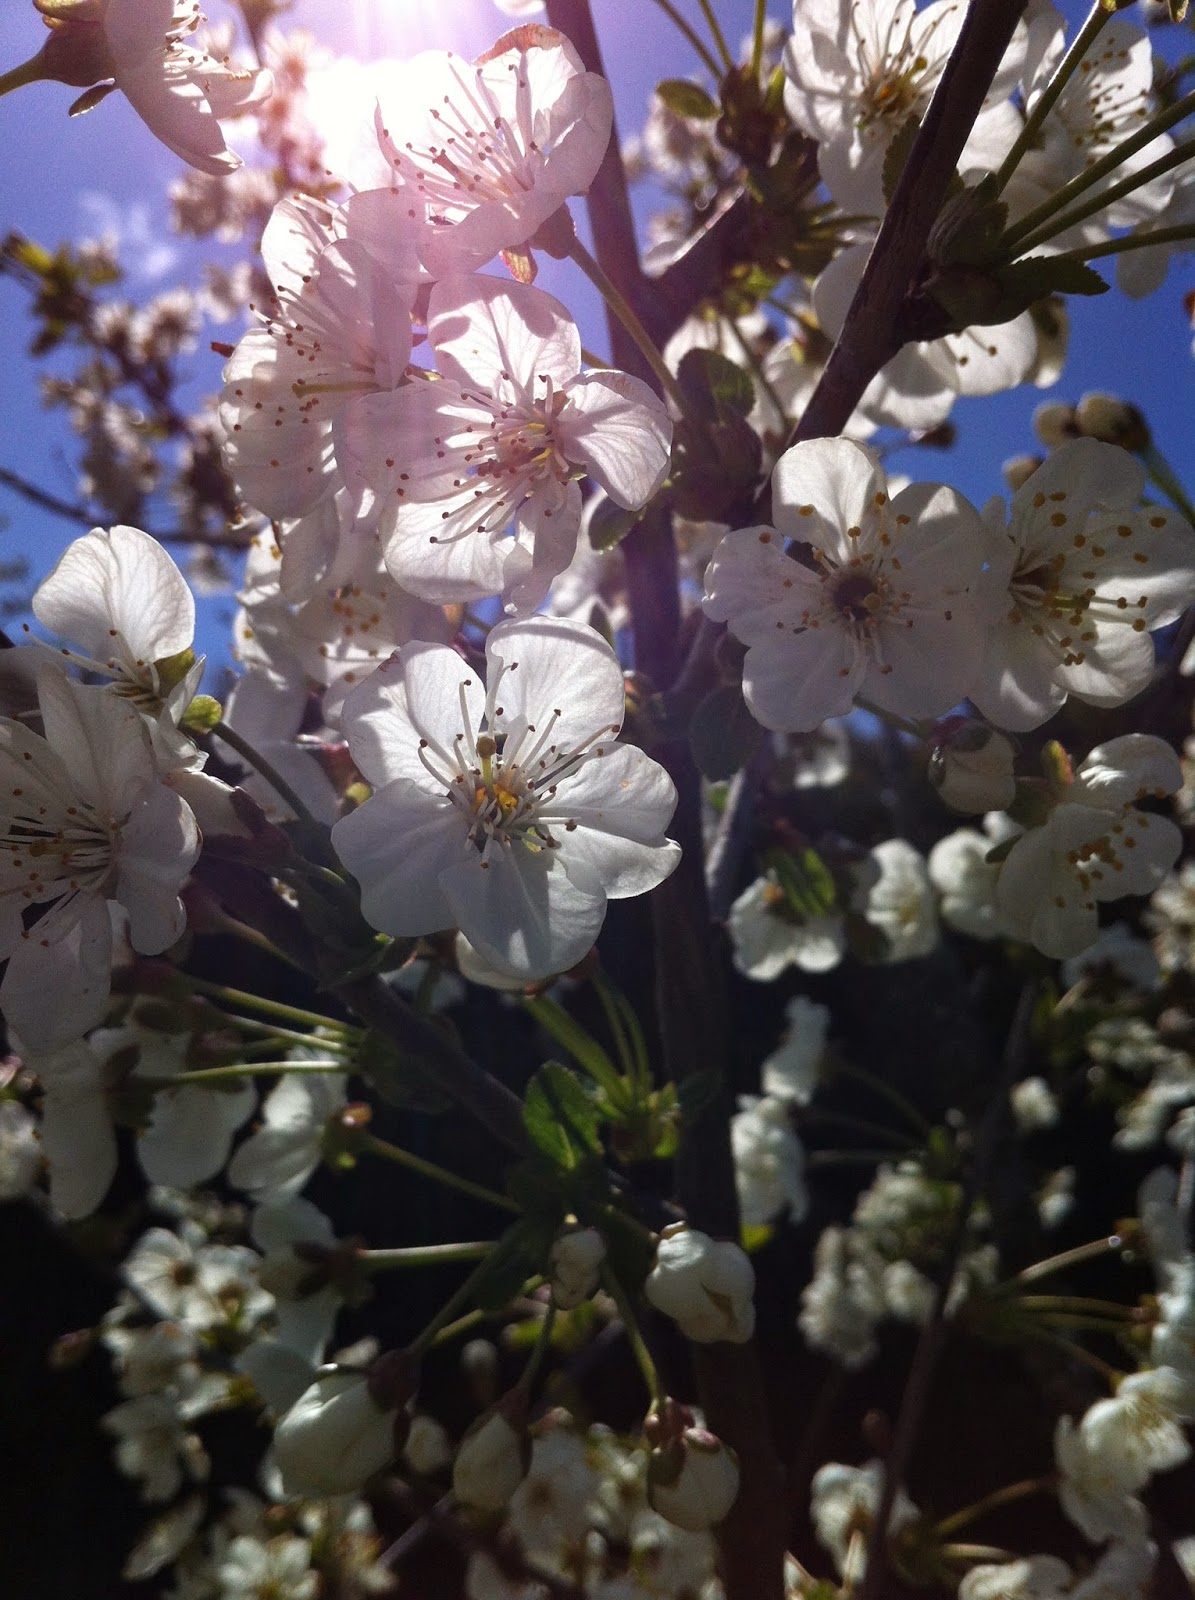 Sunlight streaming through morello cherry blosssom